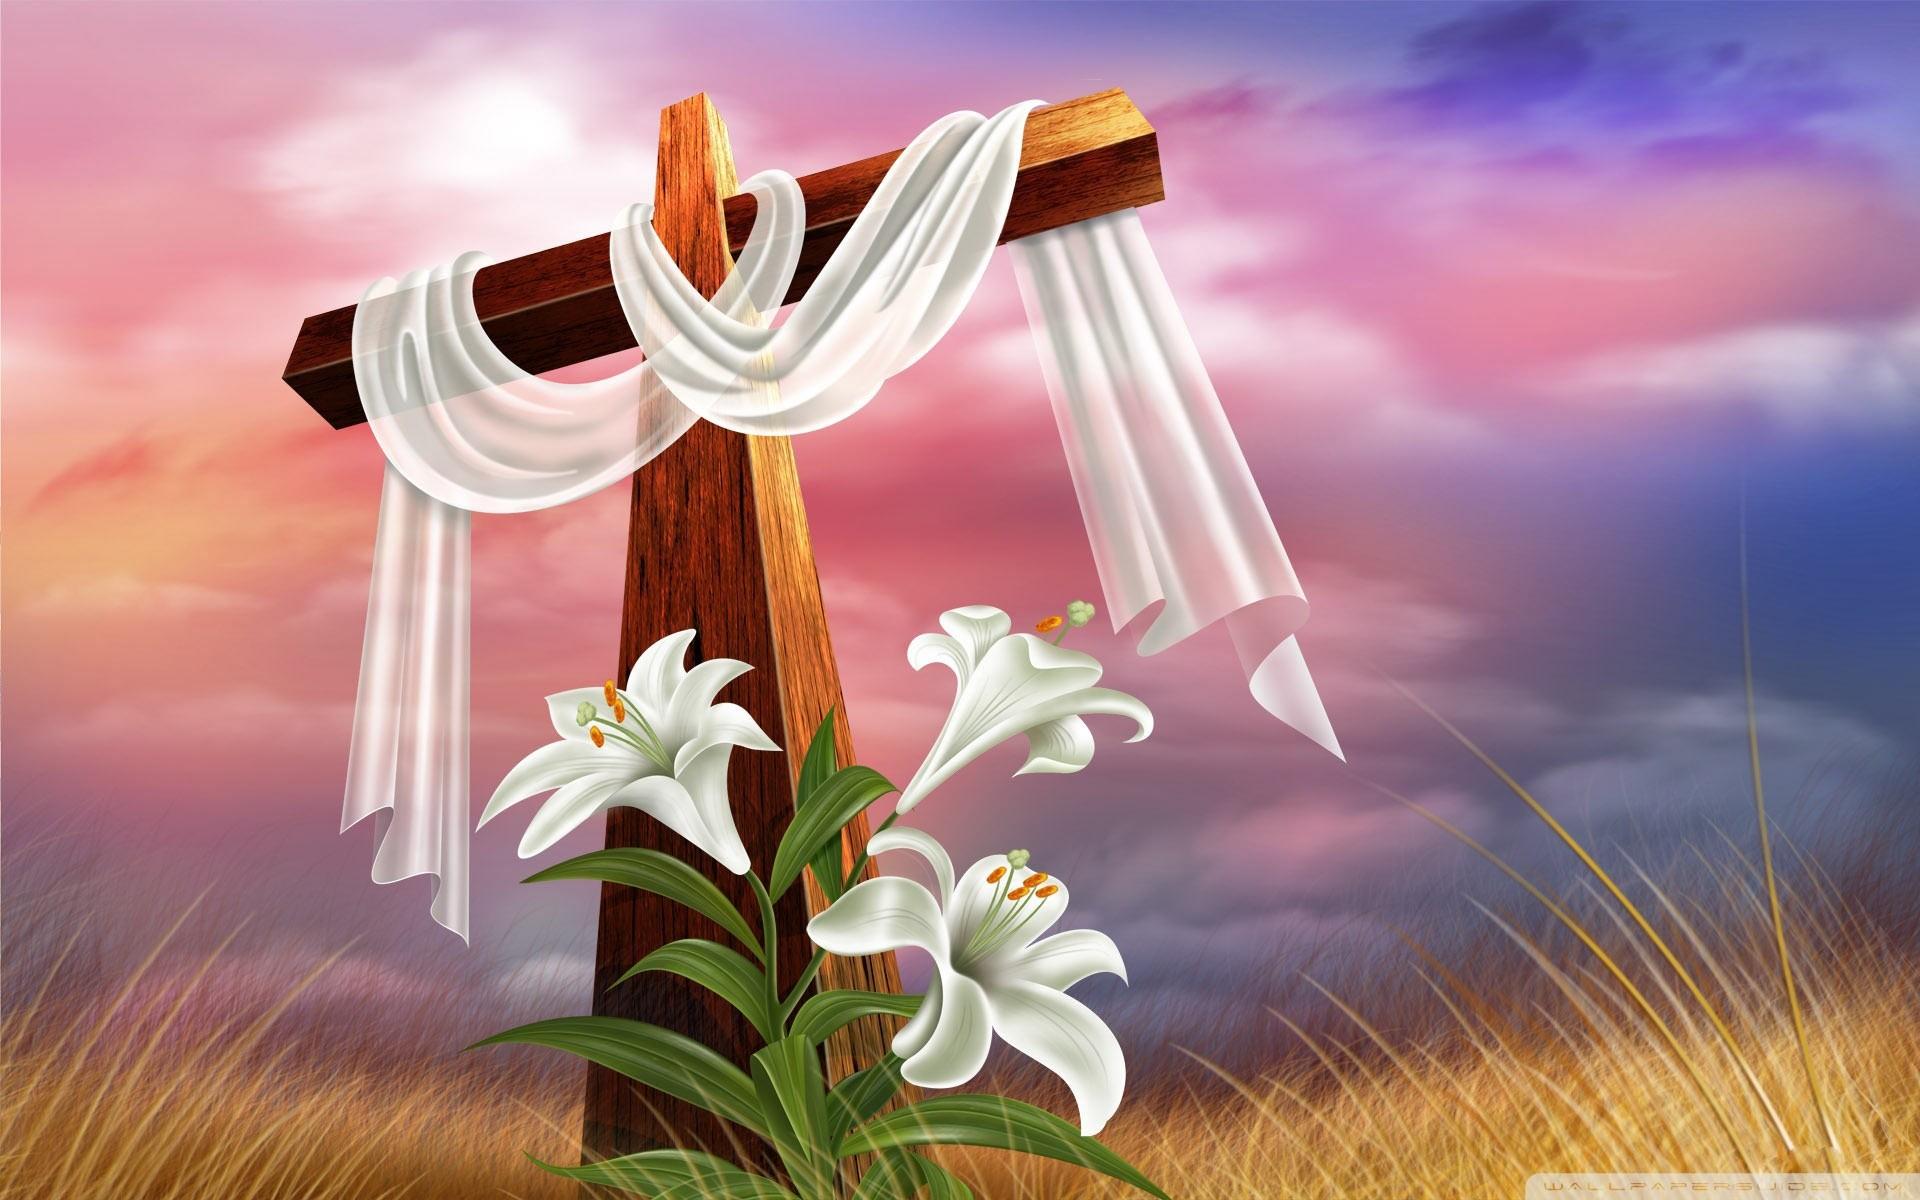 Easter Cross HD Wide Wallpaper for Widescreen